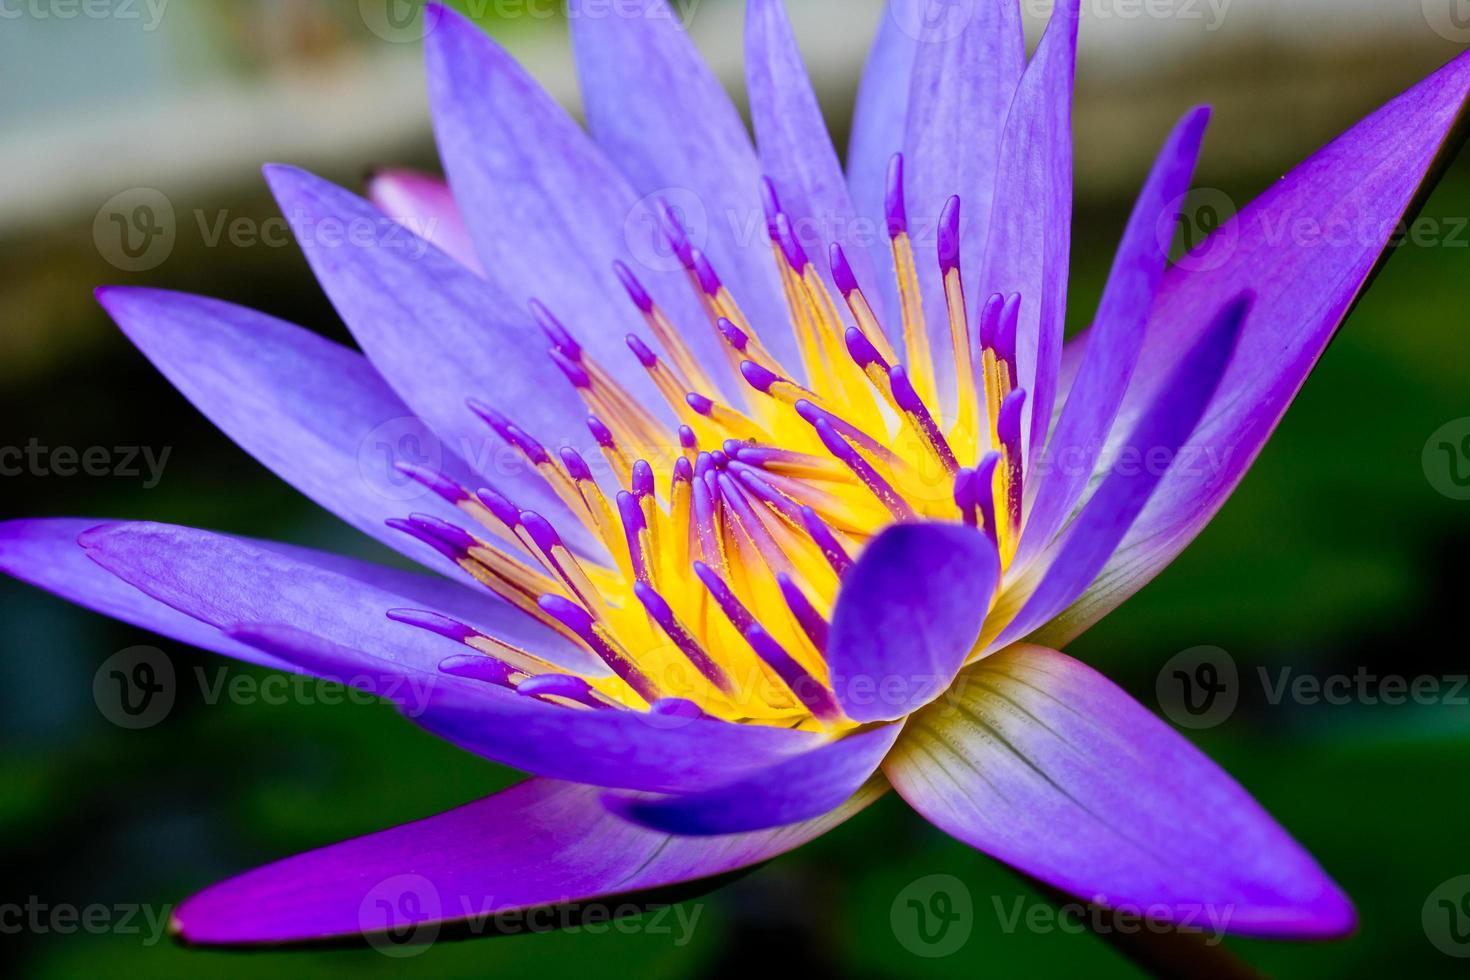 violette lotusbloem close-up foto